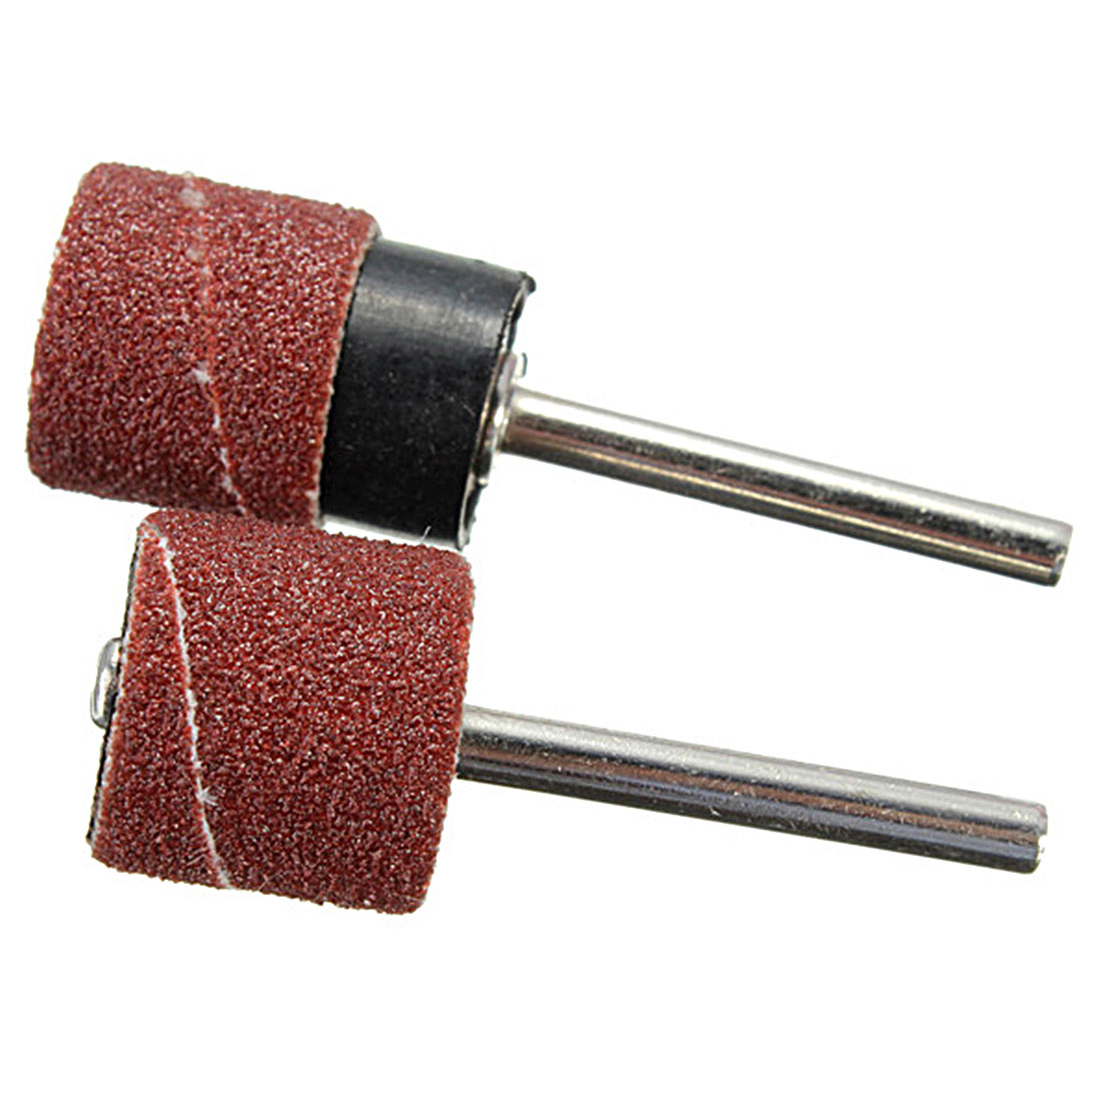 10pcs Mixed Shape abrasif Pierre Metal Grinding Head Roue Polissage Burr Bits